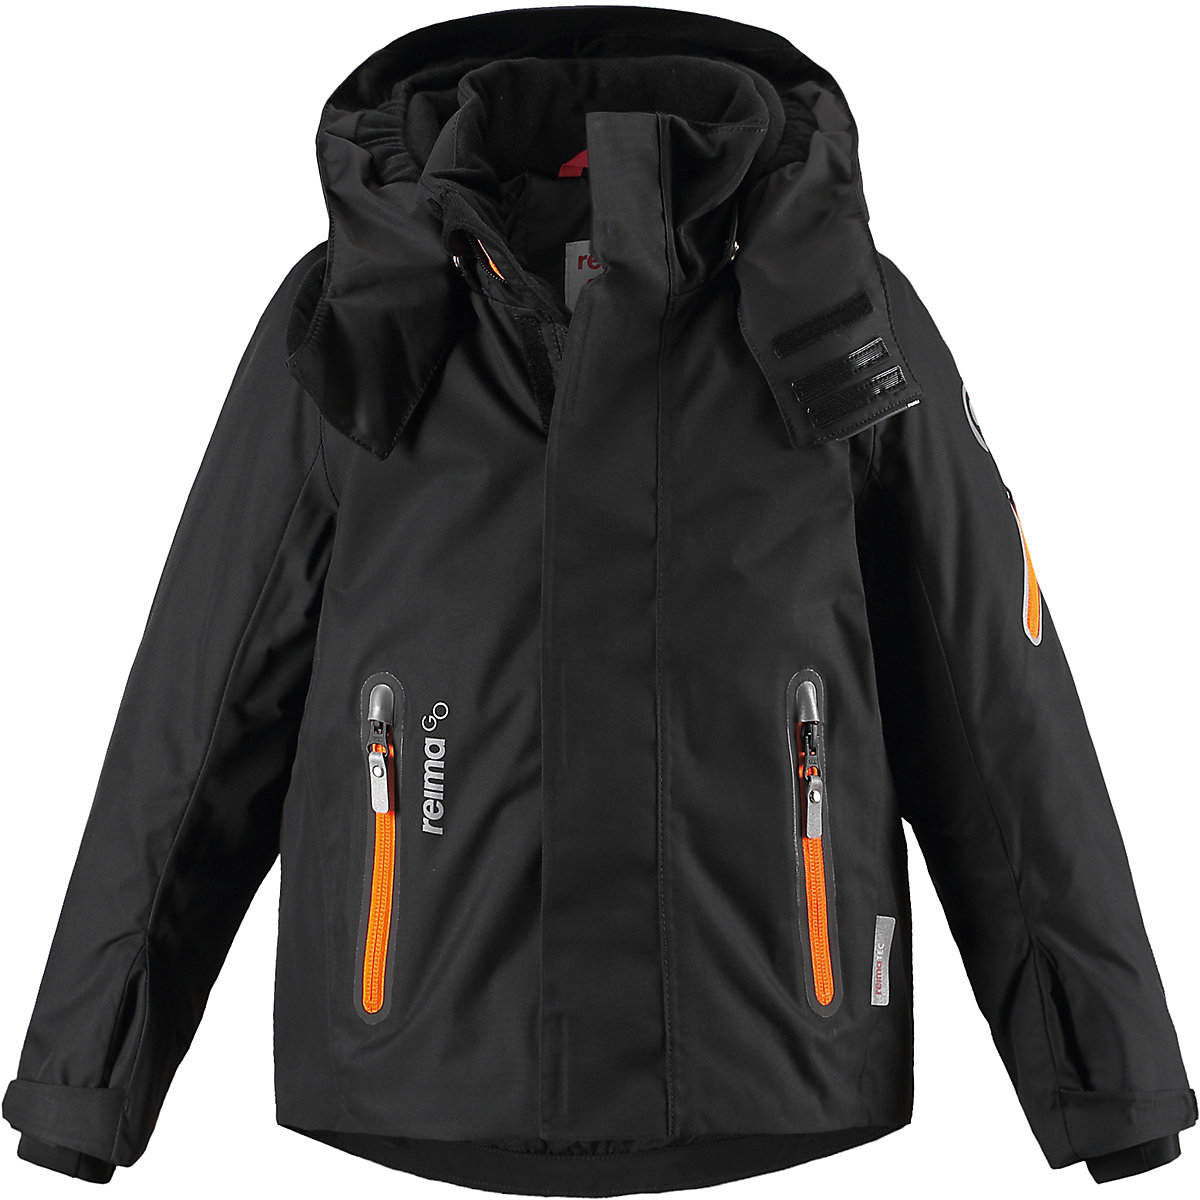 REIMA Jackets & Coats 8689609 for boys baby clothing winter warm boy girl jacket Polyester pro biker motorcycle racing jacket men s motocross motorbike moto clothing waterproof windproof jaqueta